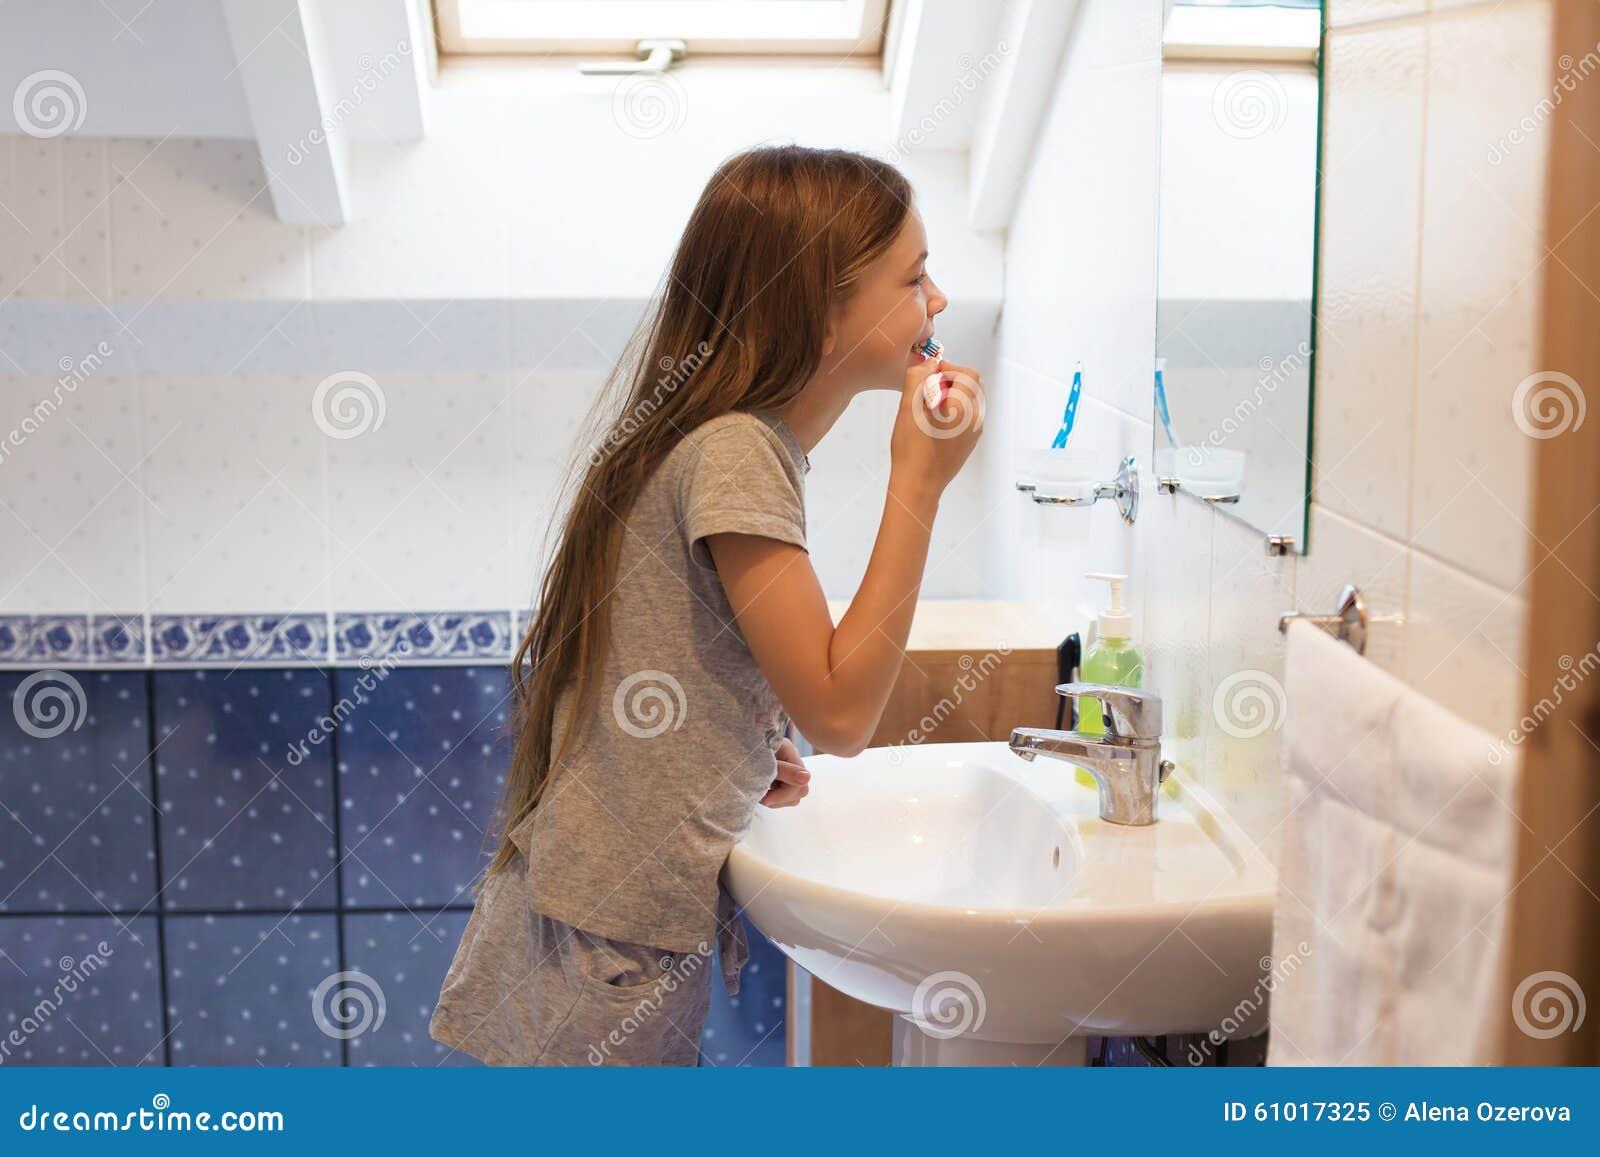 Teen girls in the bathtub